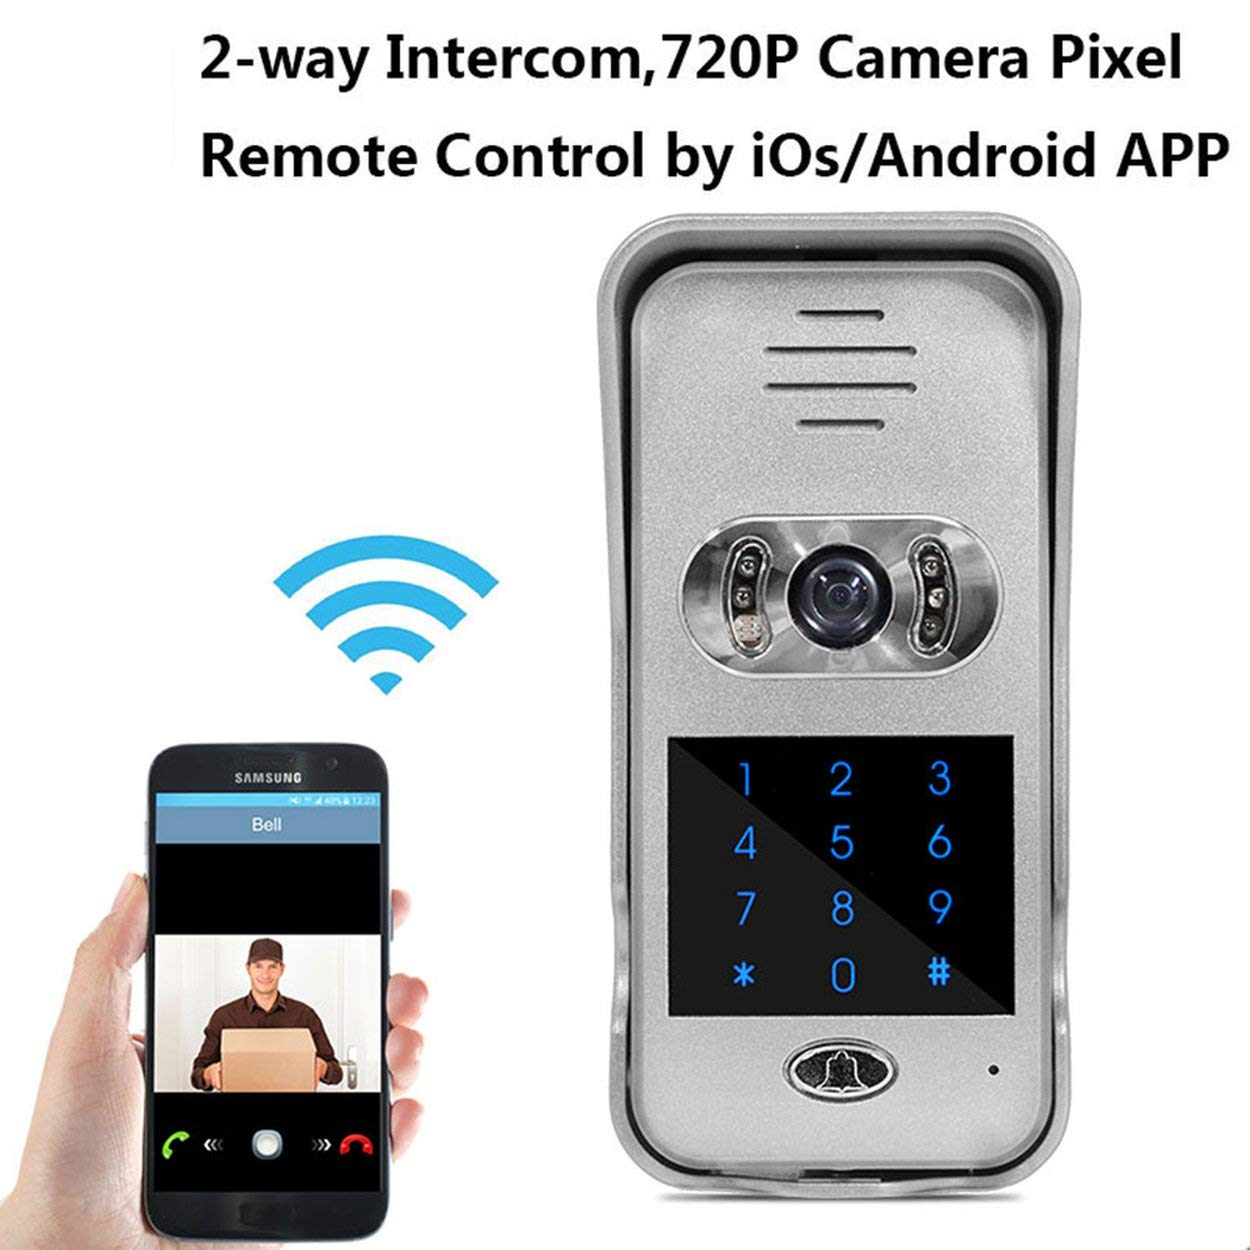 Intercom phone meaning